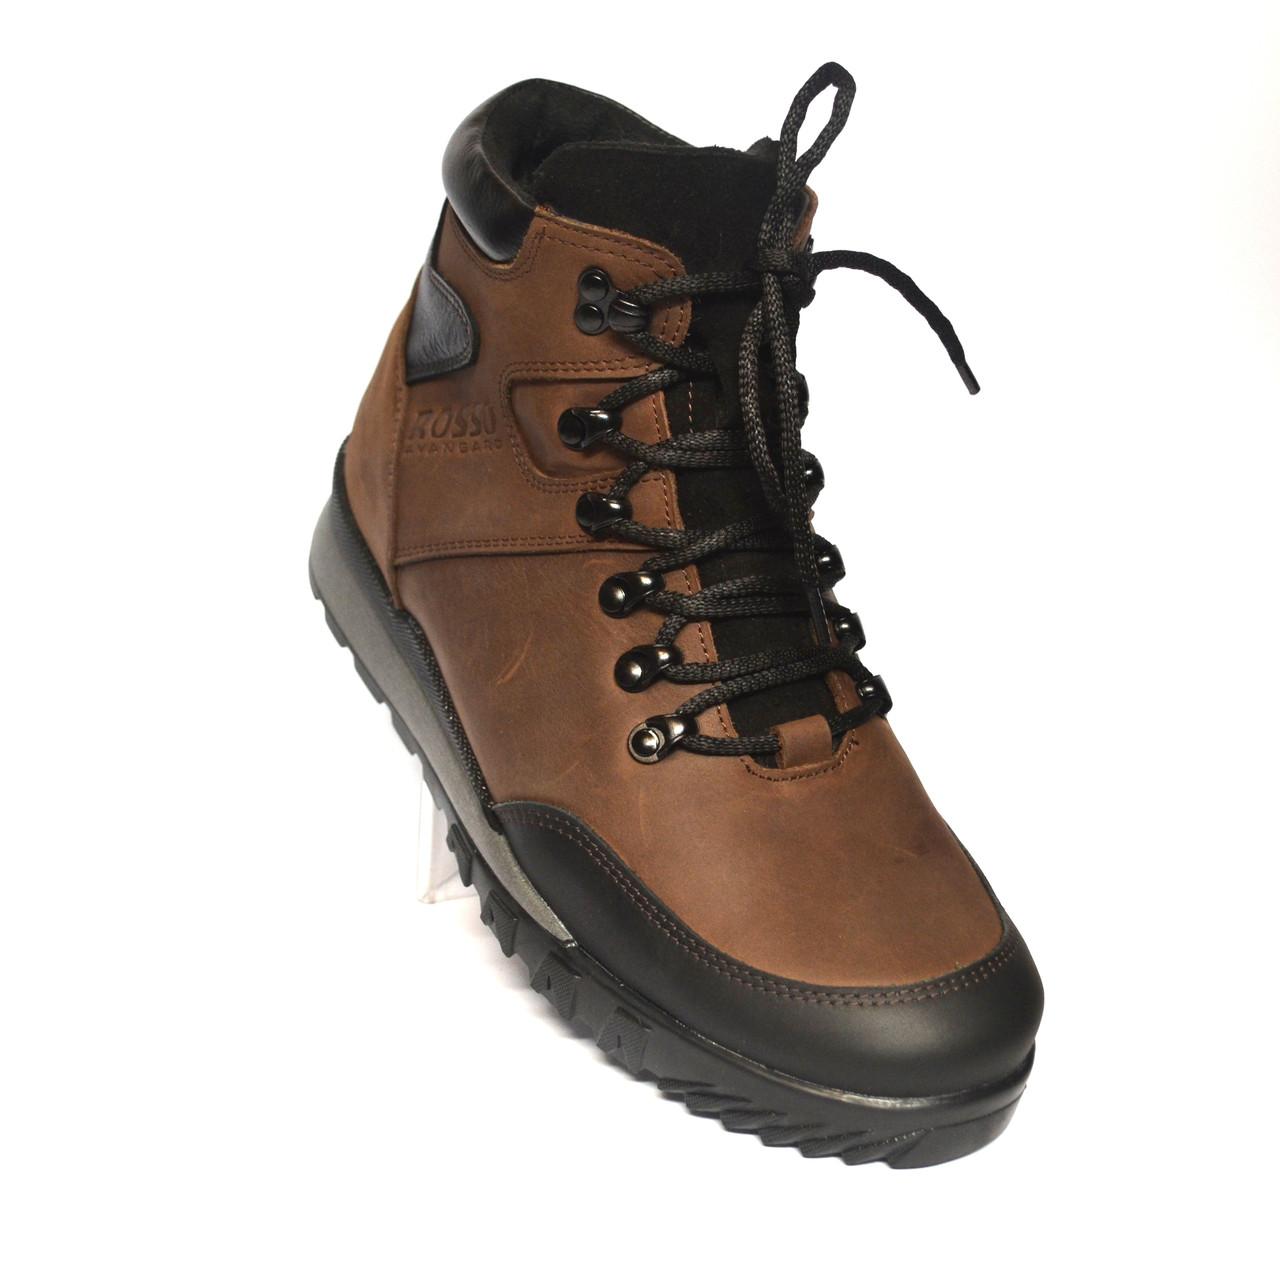 Коричневые зимние мужские ботинки Rosso Avangard Lomerback Grayline Brown Кожа